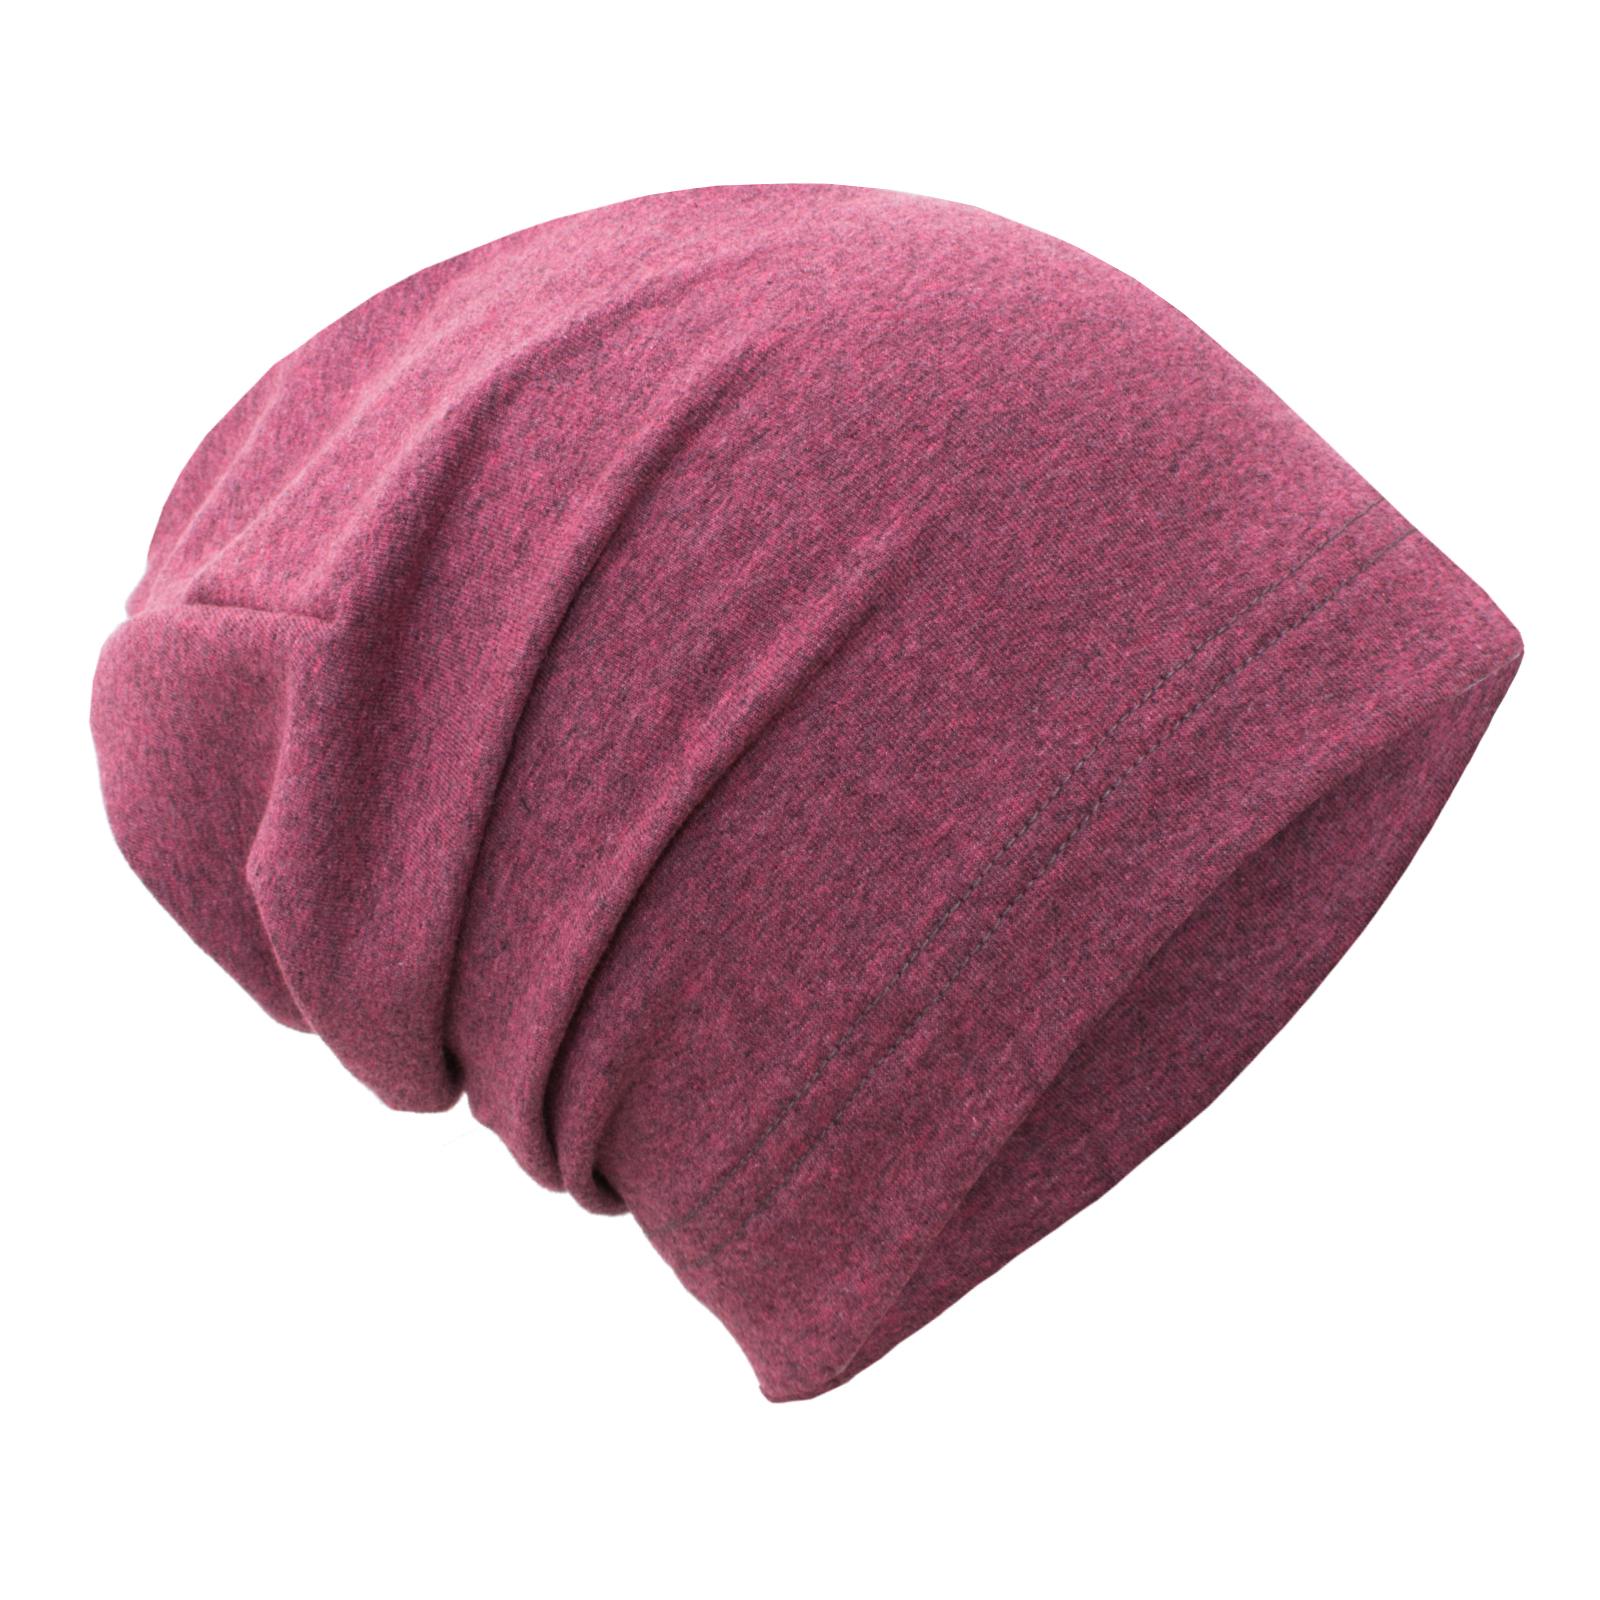 unuo teplákovinová čepice spadená, Růžový melír